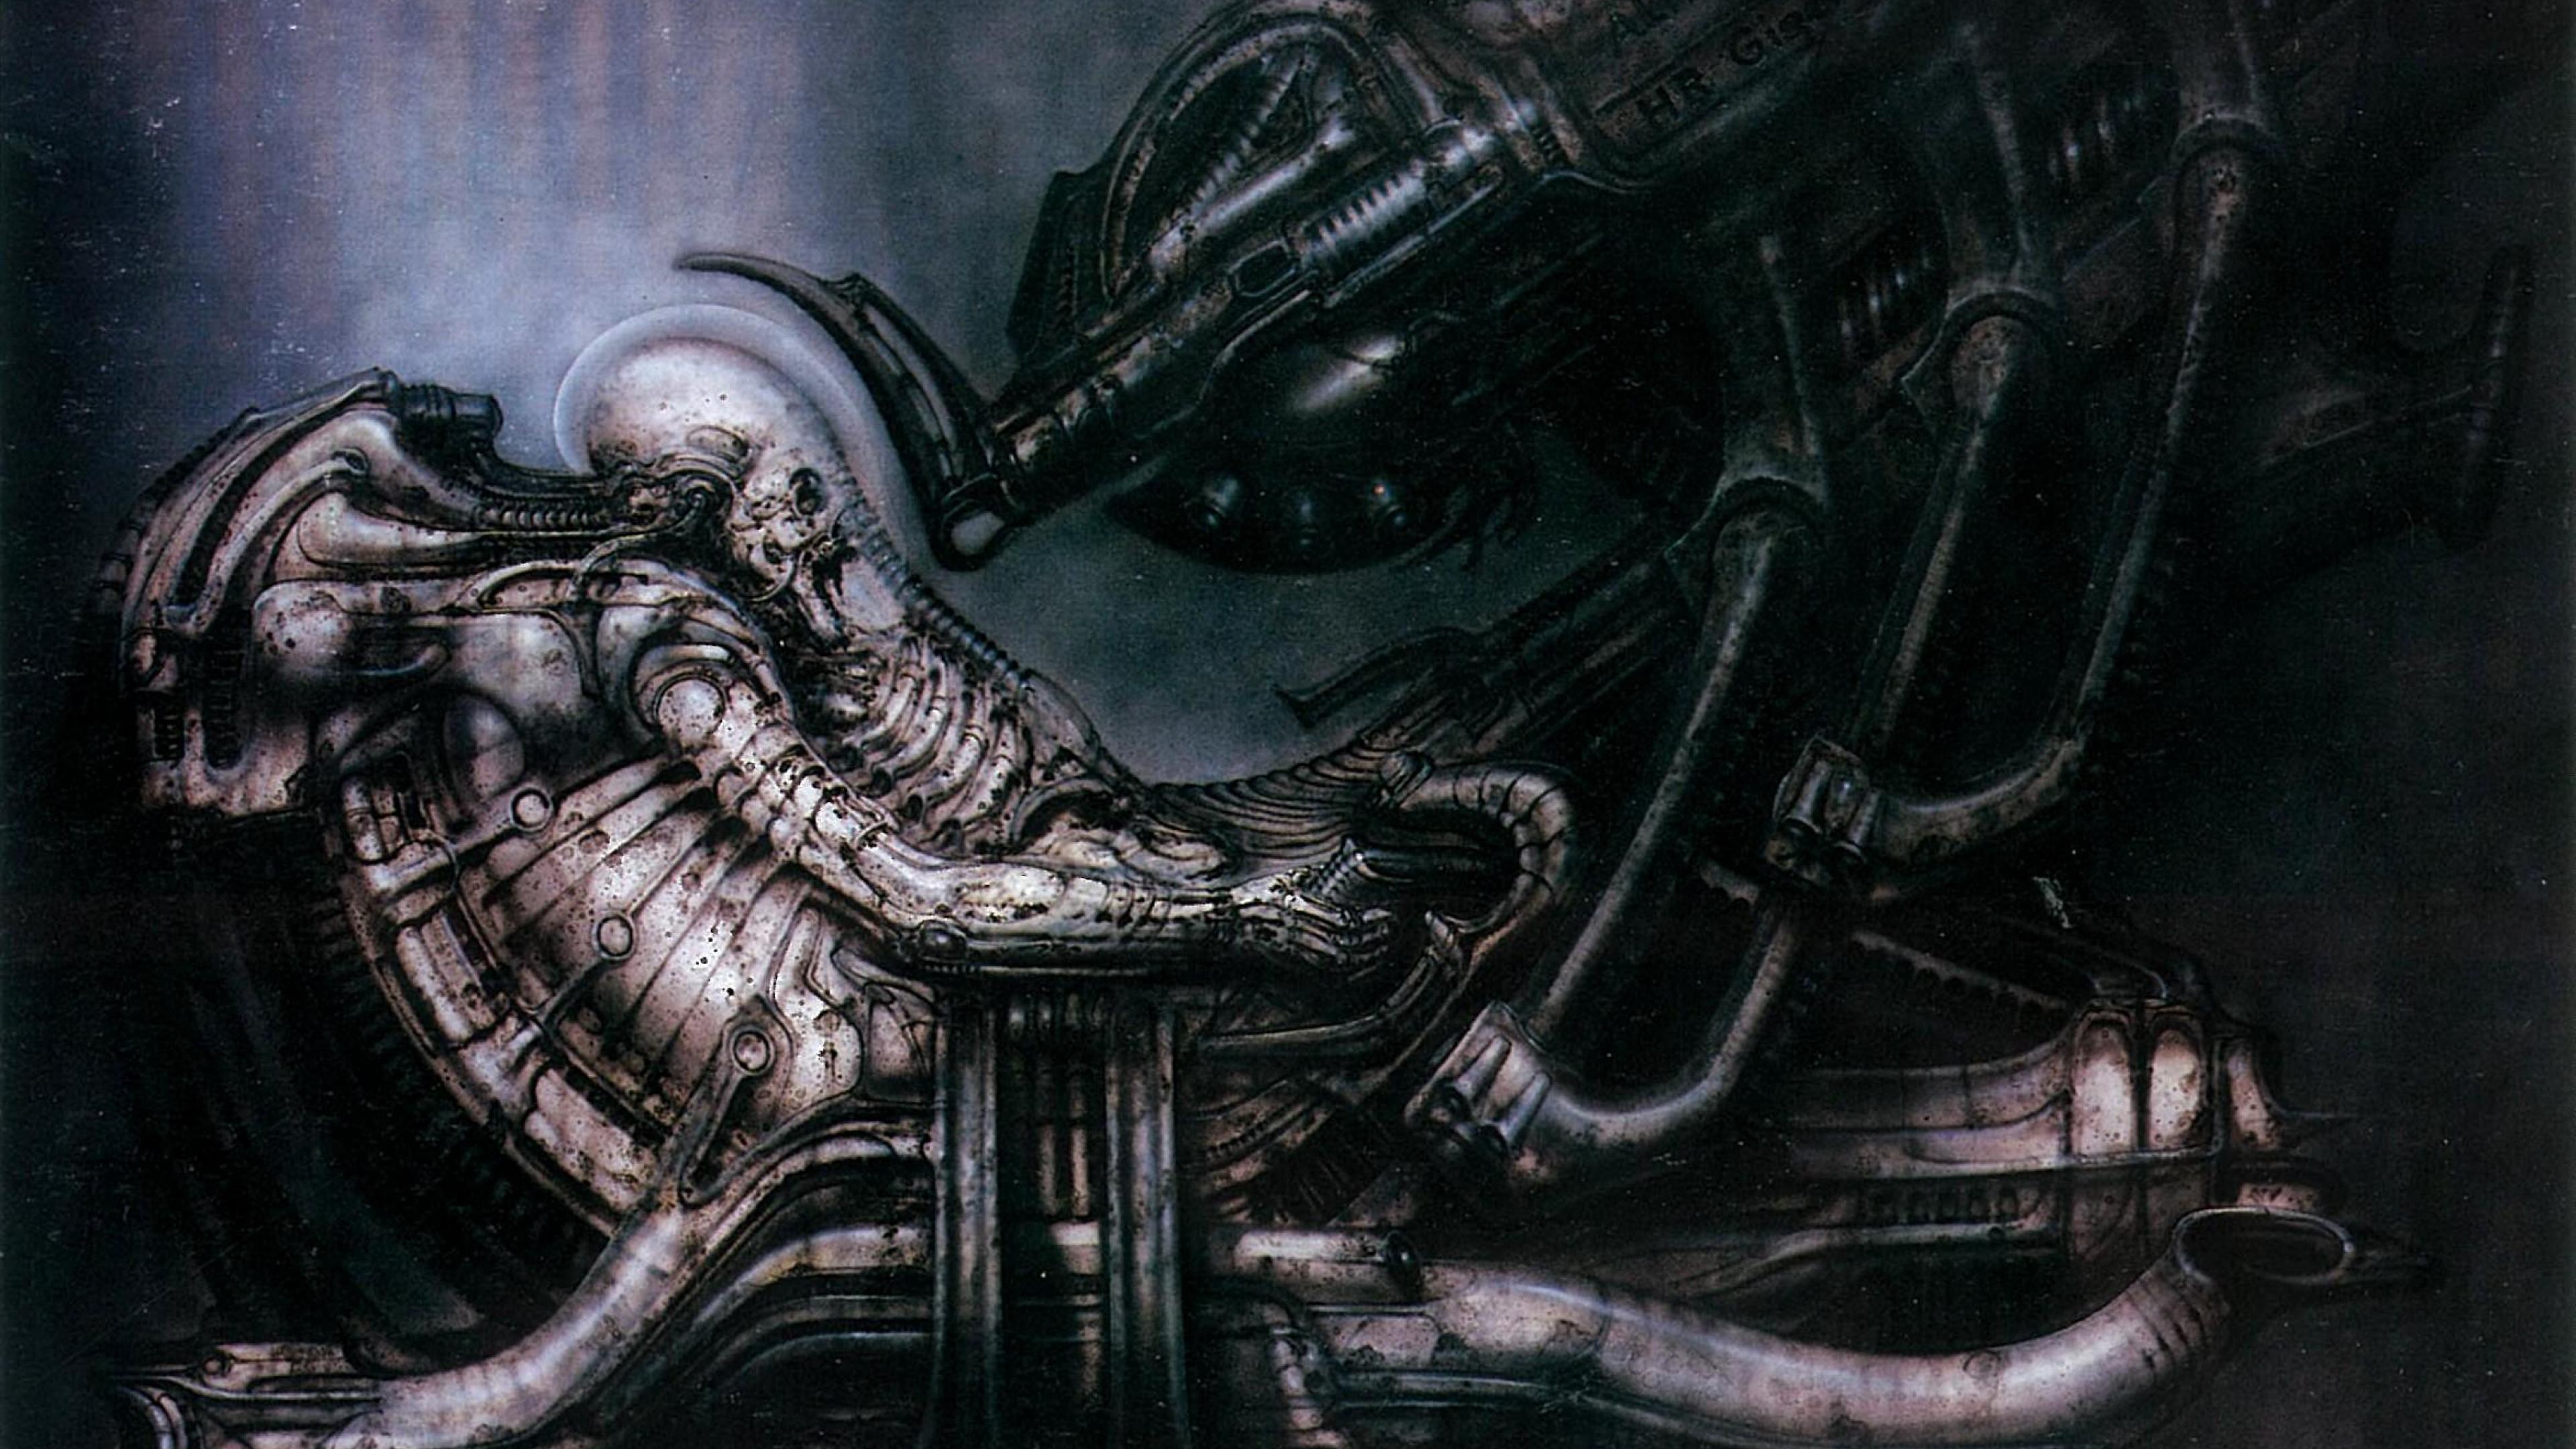 Free Download Machine Prometheus Movie Aliens Movie H R